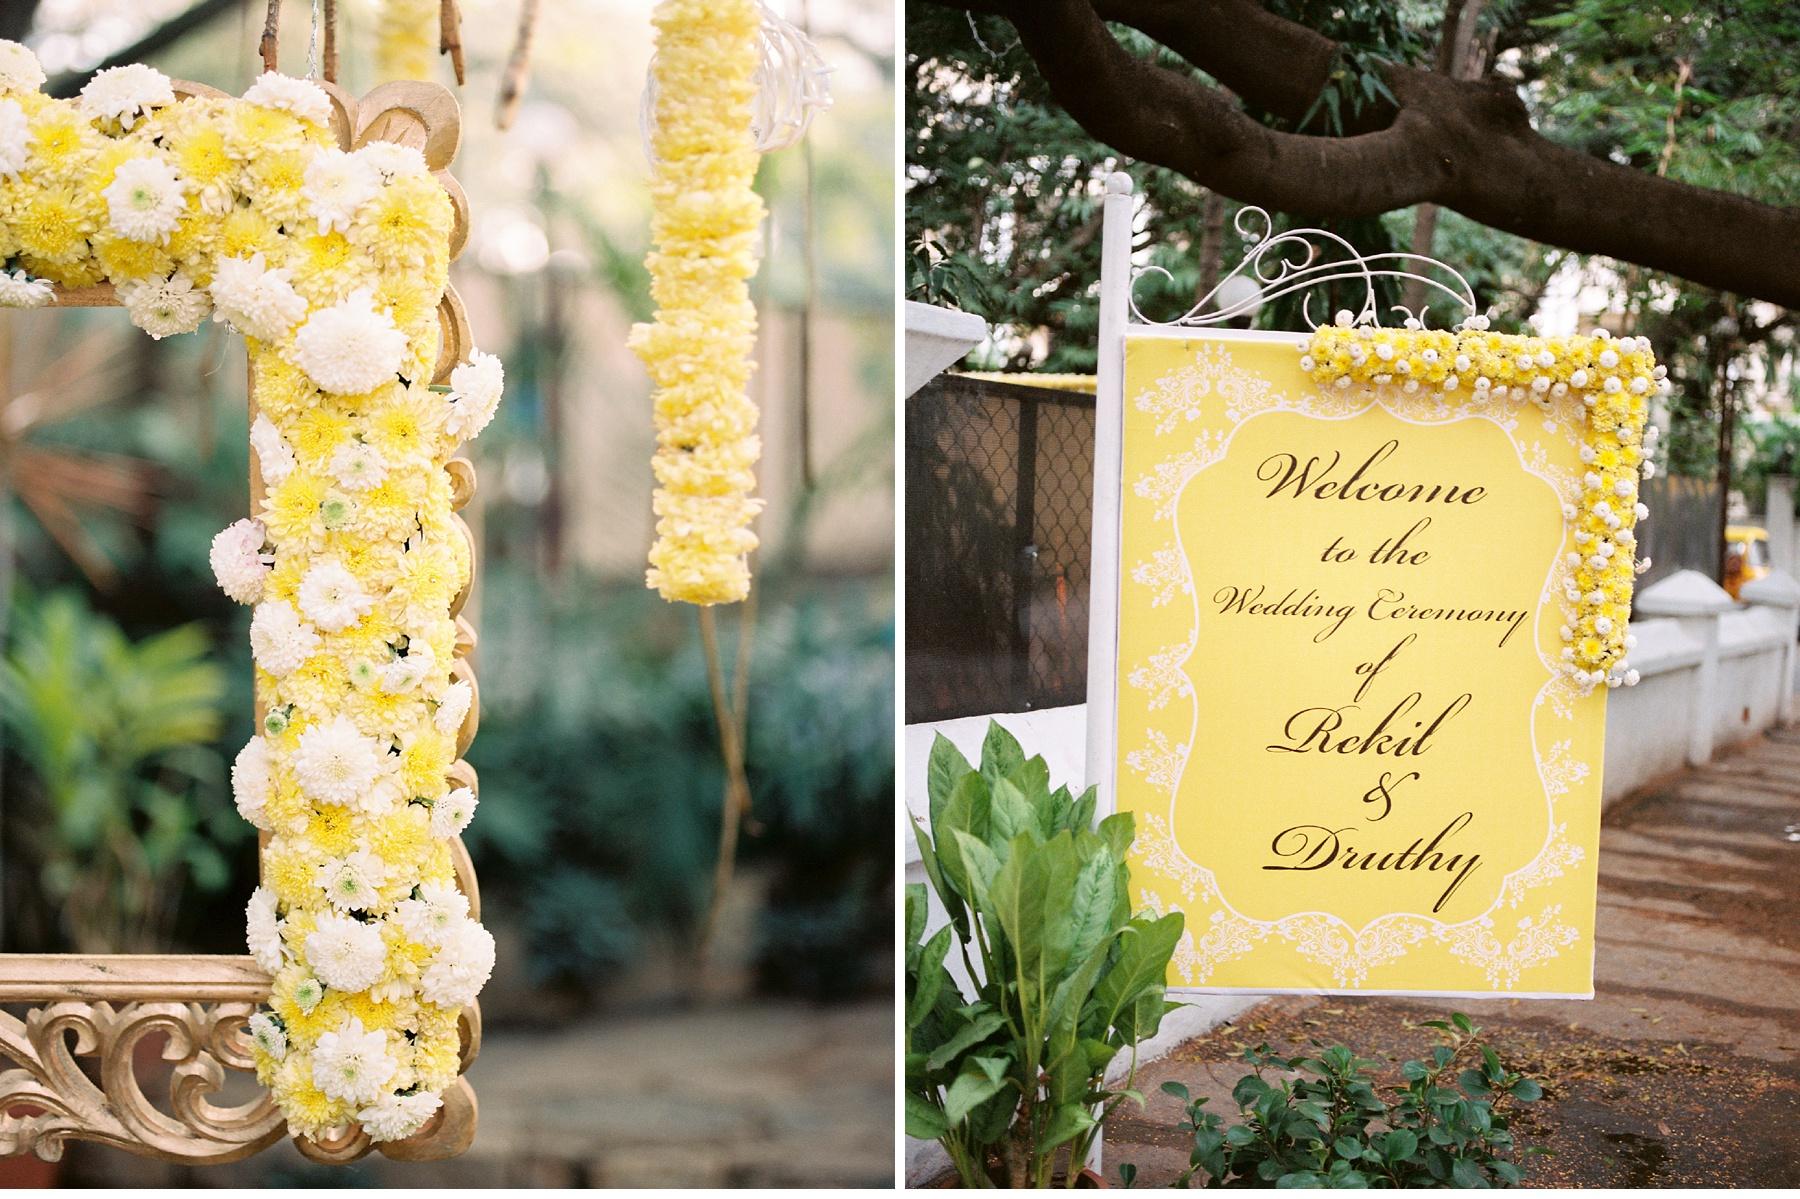 Southern_India_Wedding_Ceremony_00001.jpg